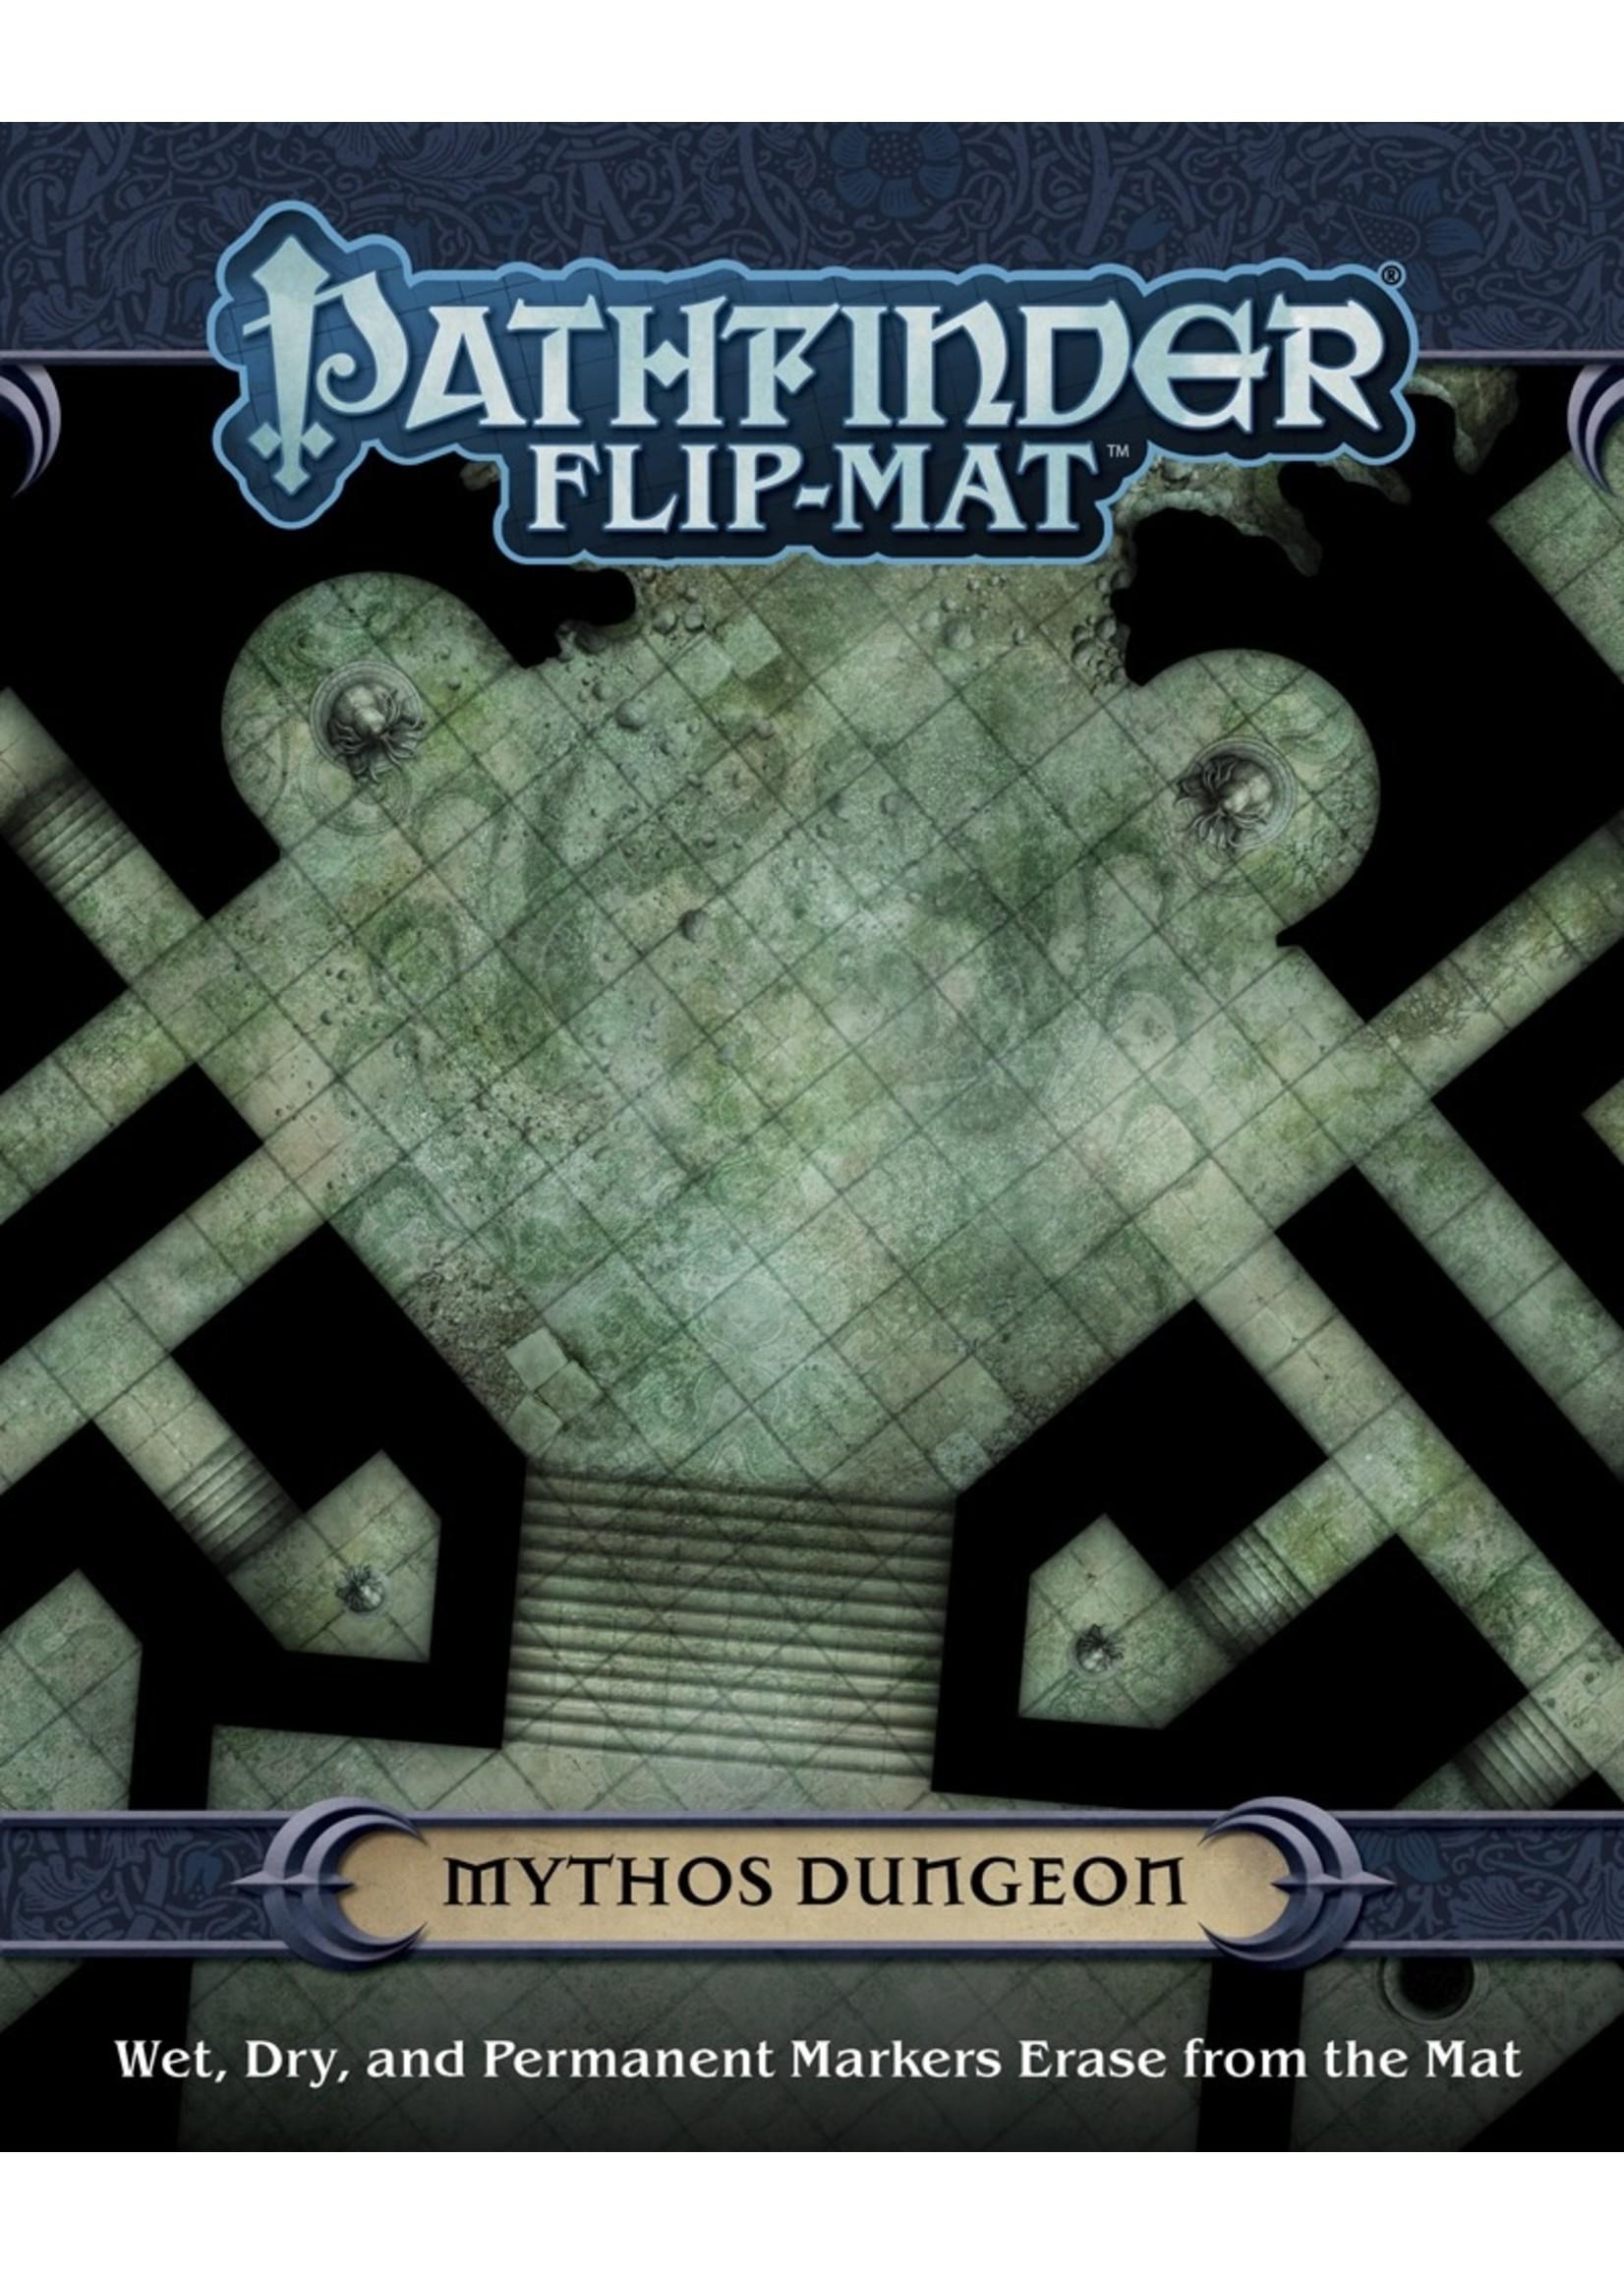 Pathfinder RPG: Flip-Mat - Mythos Dungeon